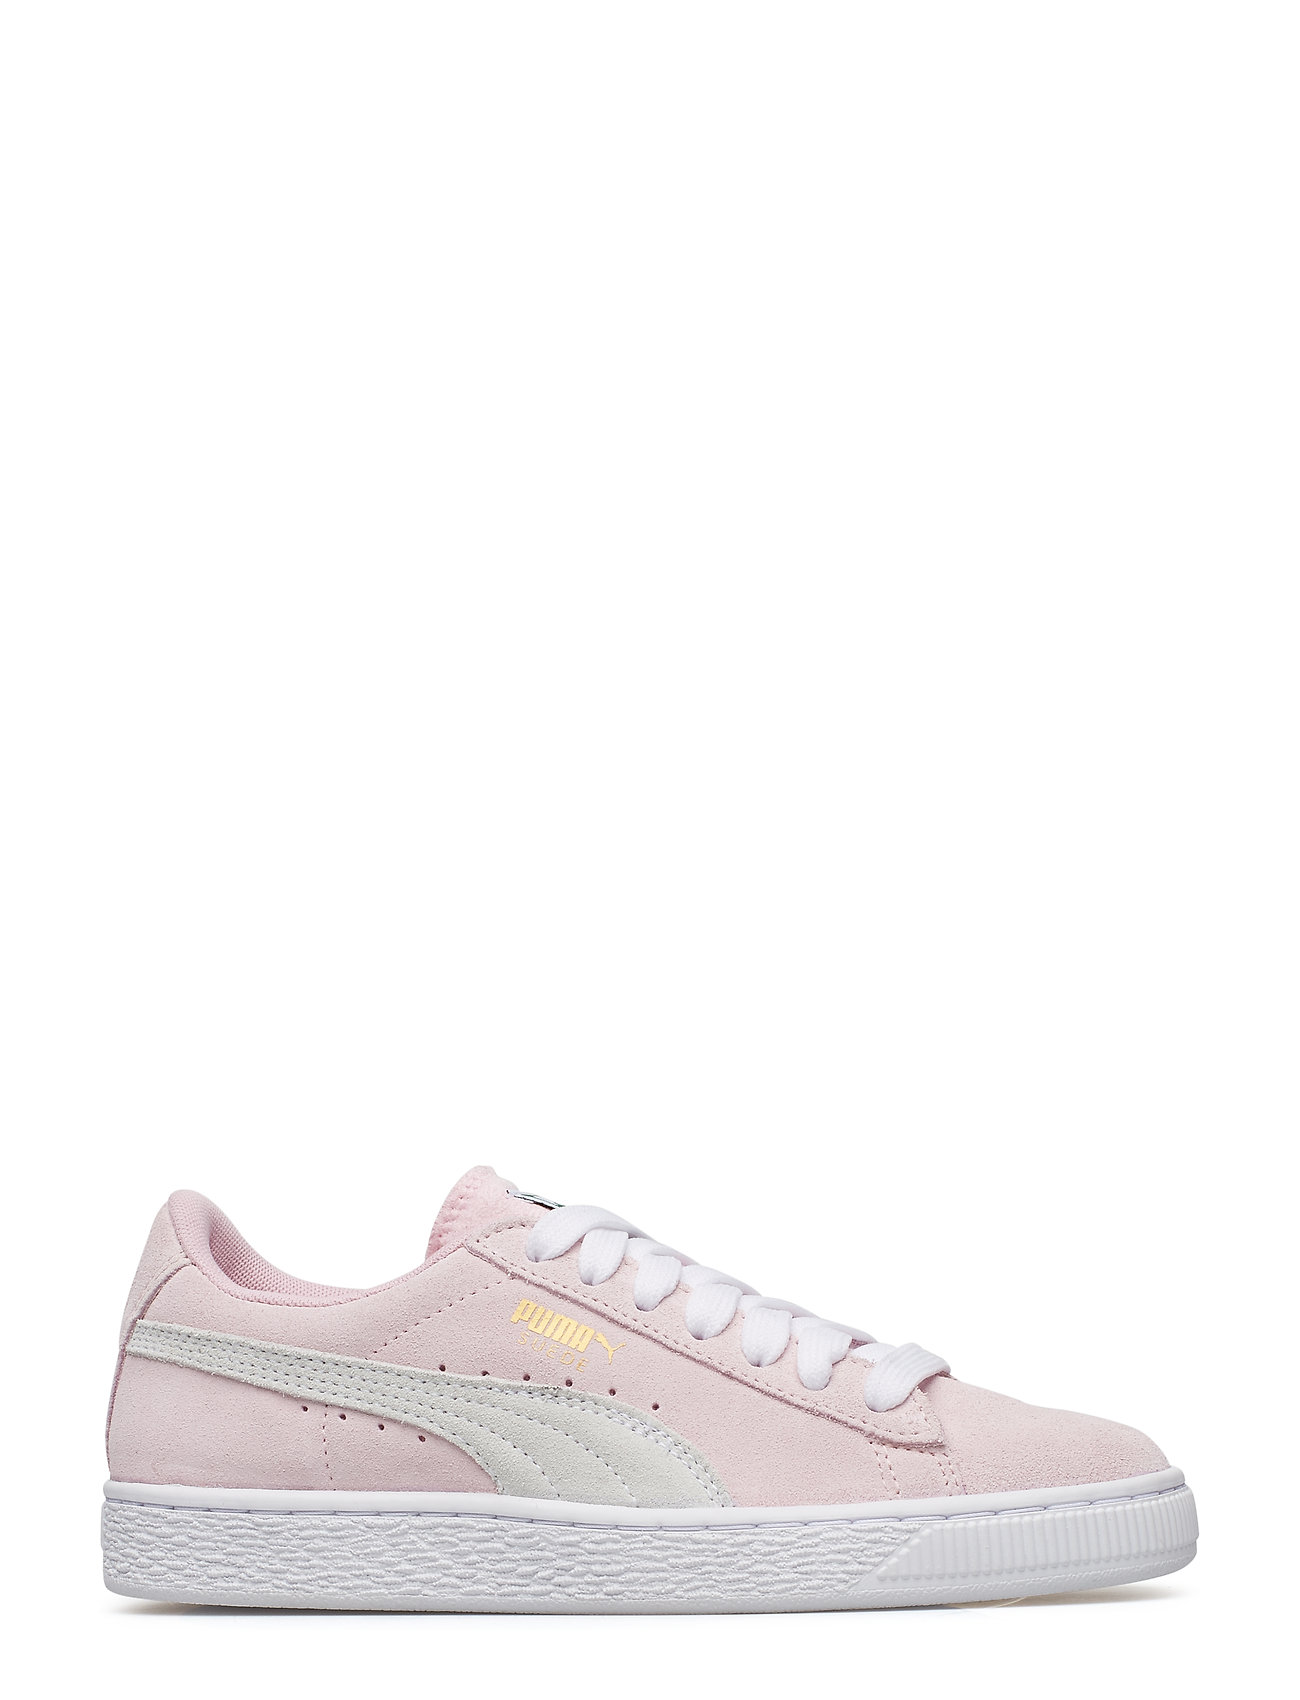 Puma Sko – Kæmpe udvalg af Puma Sneakers online